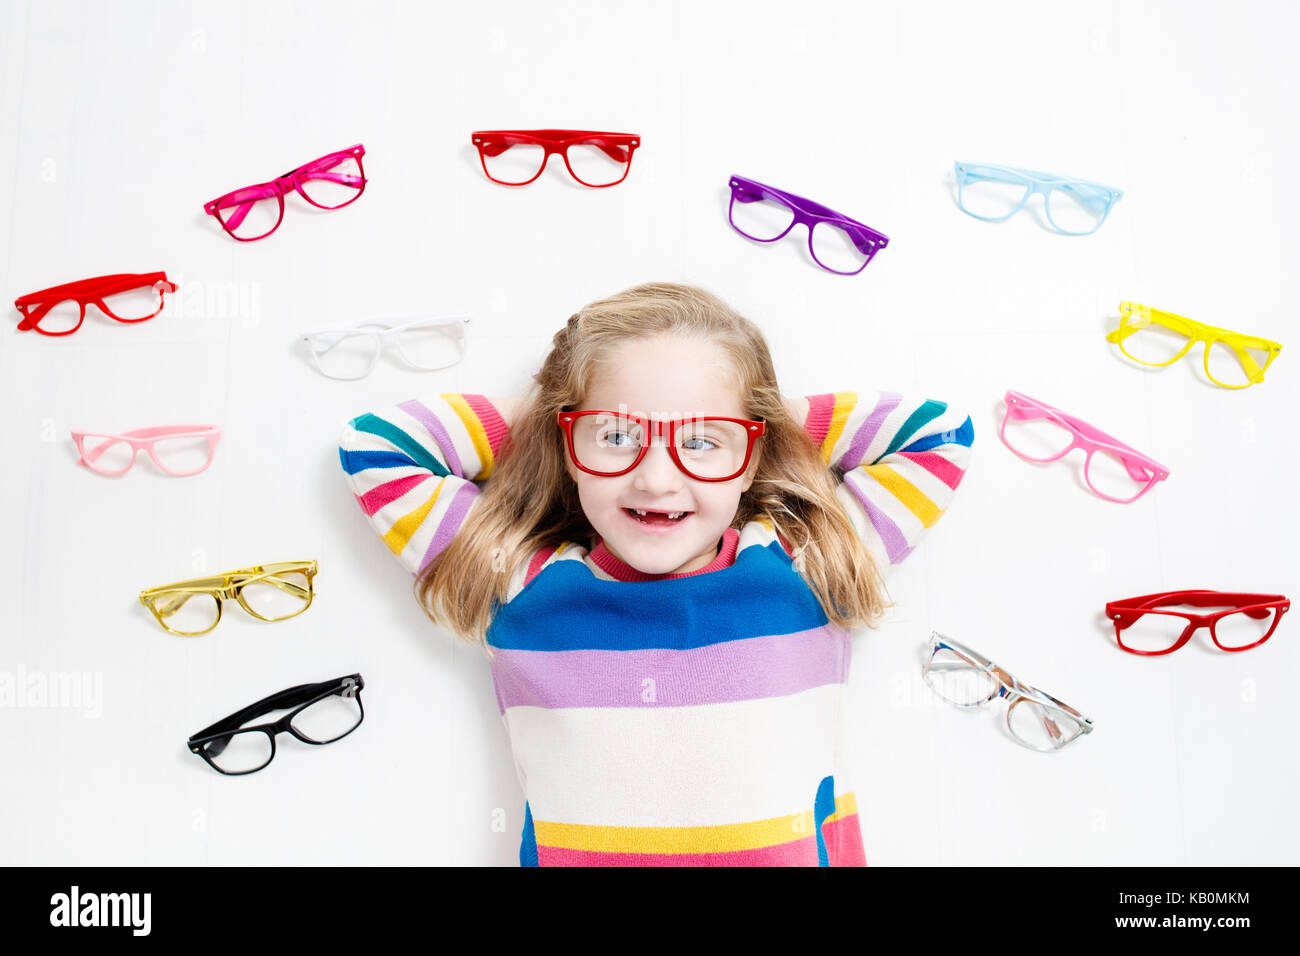 6972bfa64d Child at eye sight test. Little kid selecting glasses at optician store. Eyesight  measurement for school kids. Eye wear for children. Doctor performin